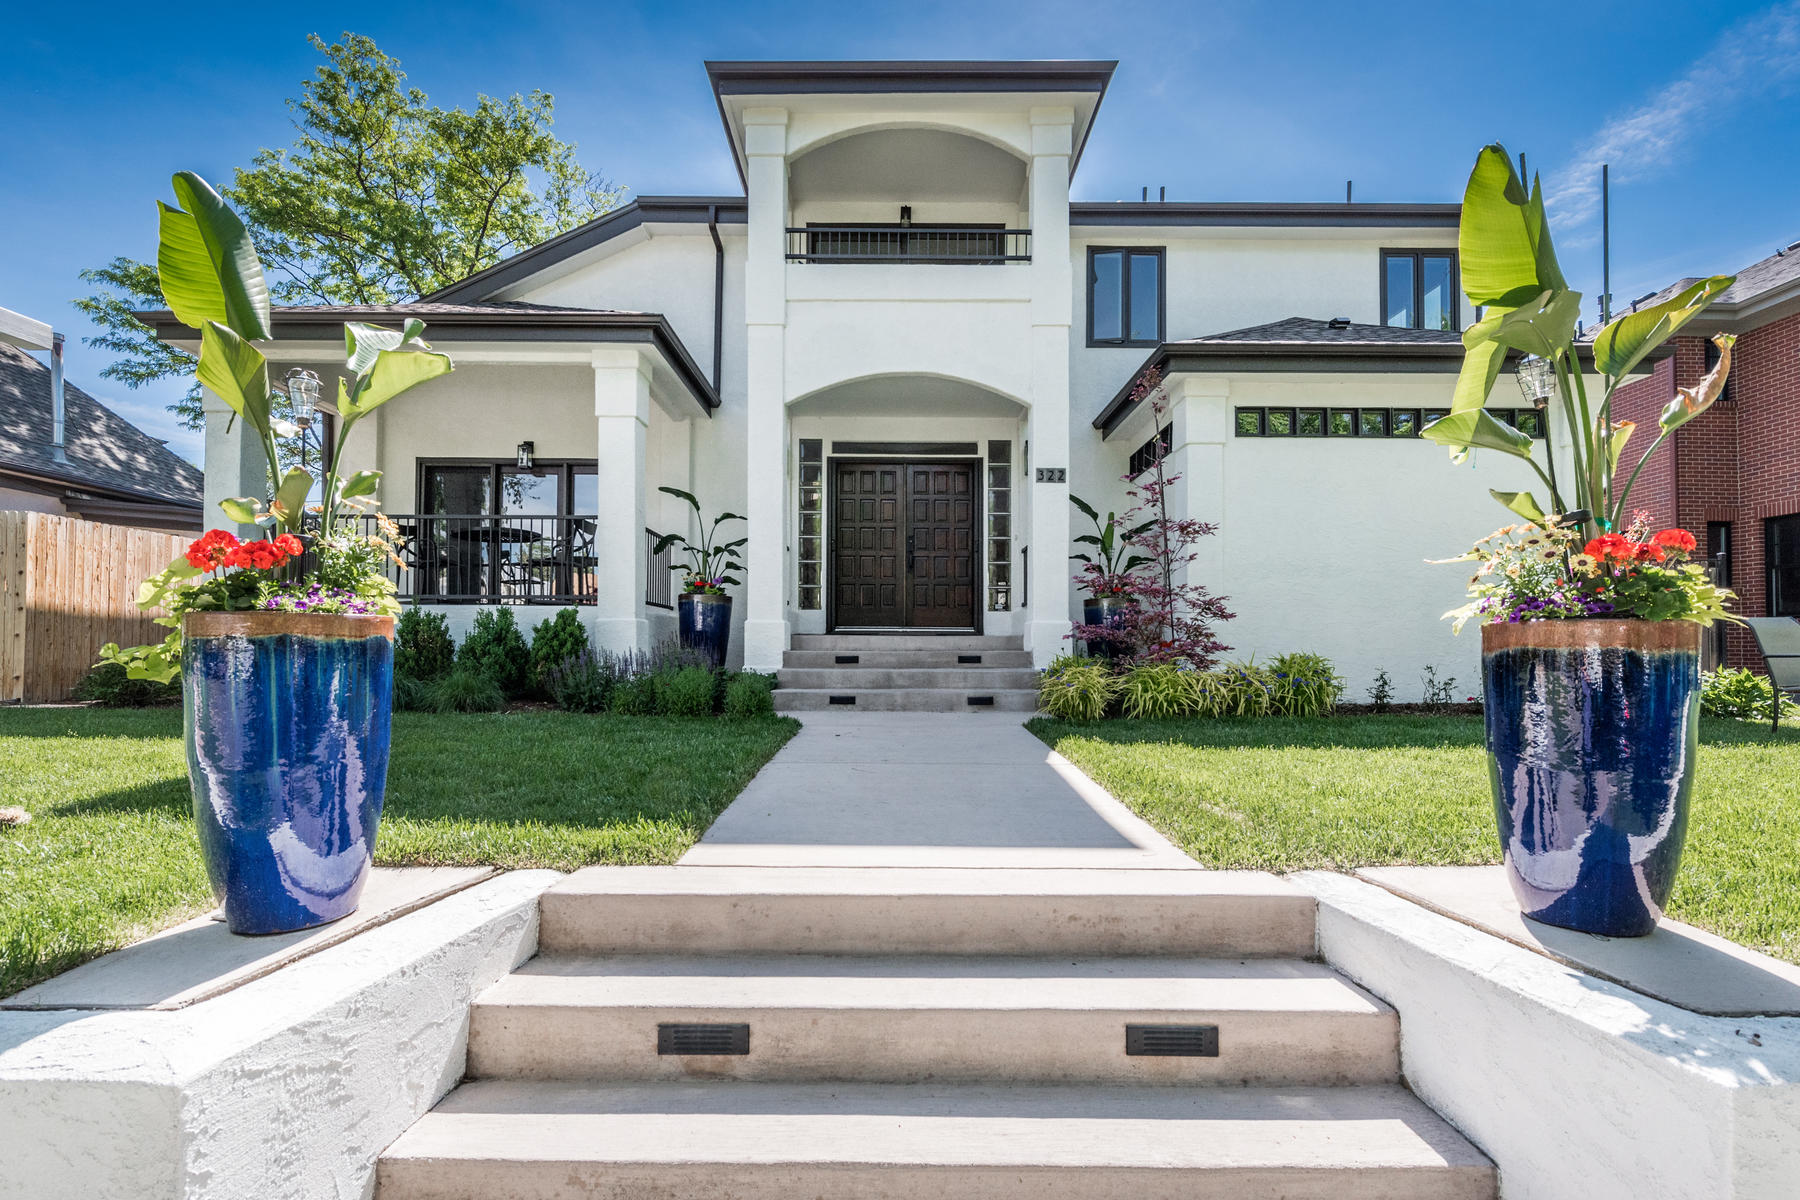 Property для того Продажа на Sophisticated Remodel in Denver's Most Sought After Neighborhood 322 S Williams Street, Denver, Колорадо 80209 Соединенные Штаты